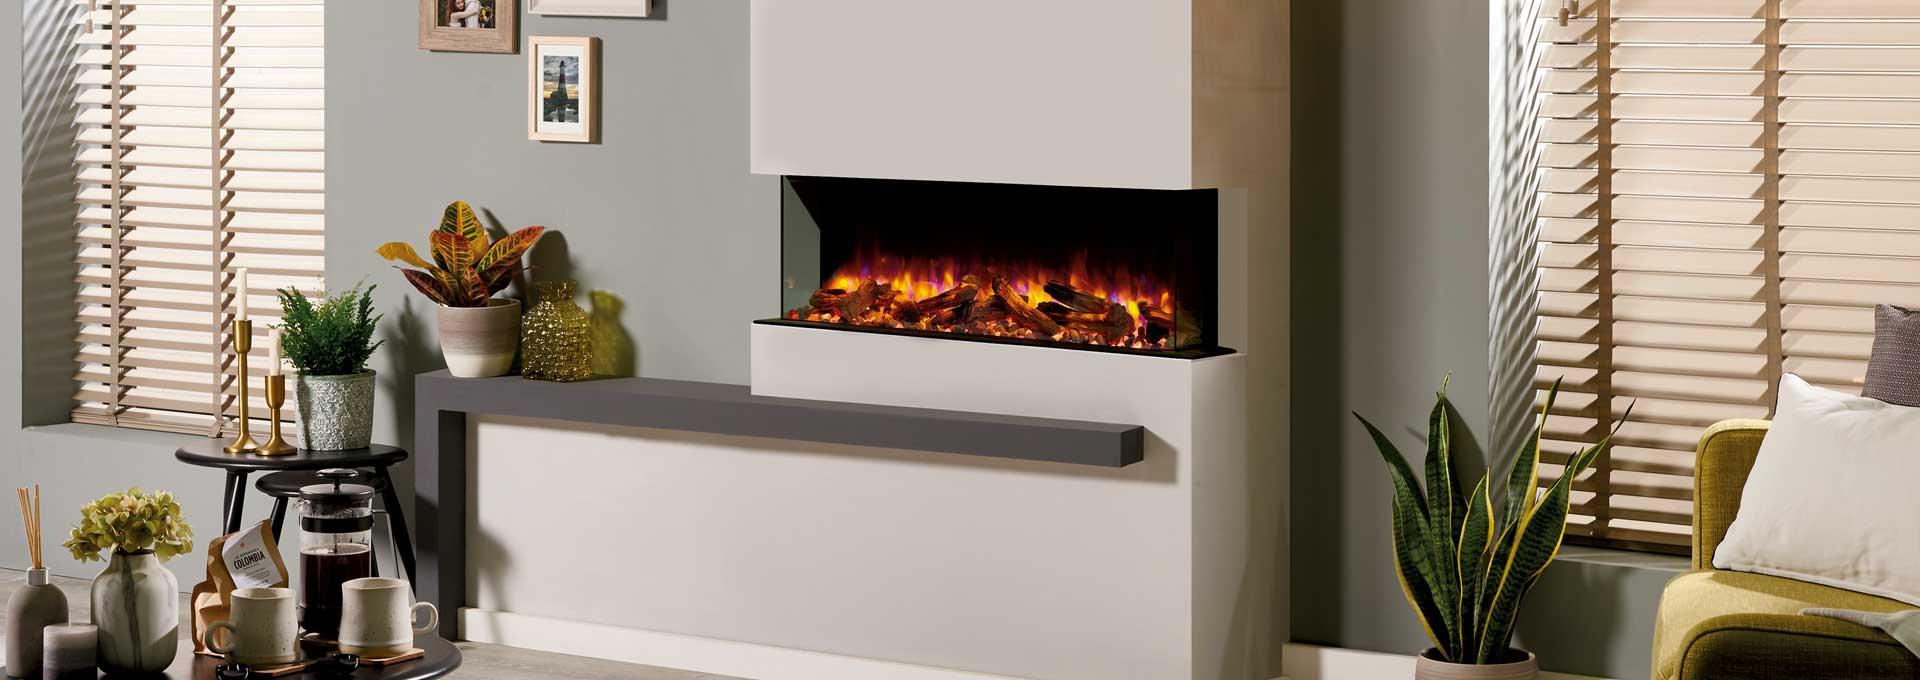 Skope E110 Multi Sided Electric Fireplace Regency Fireplace Products